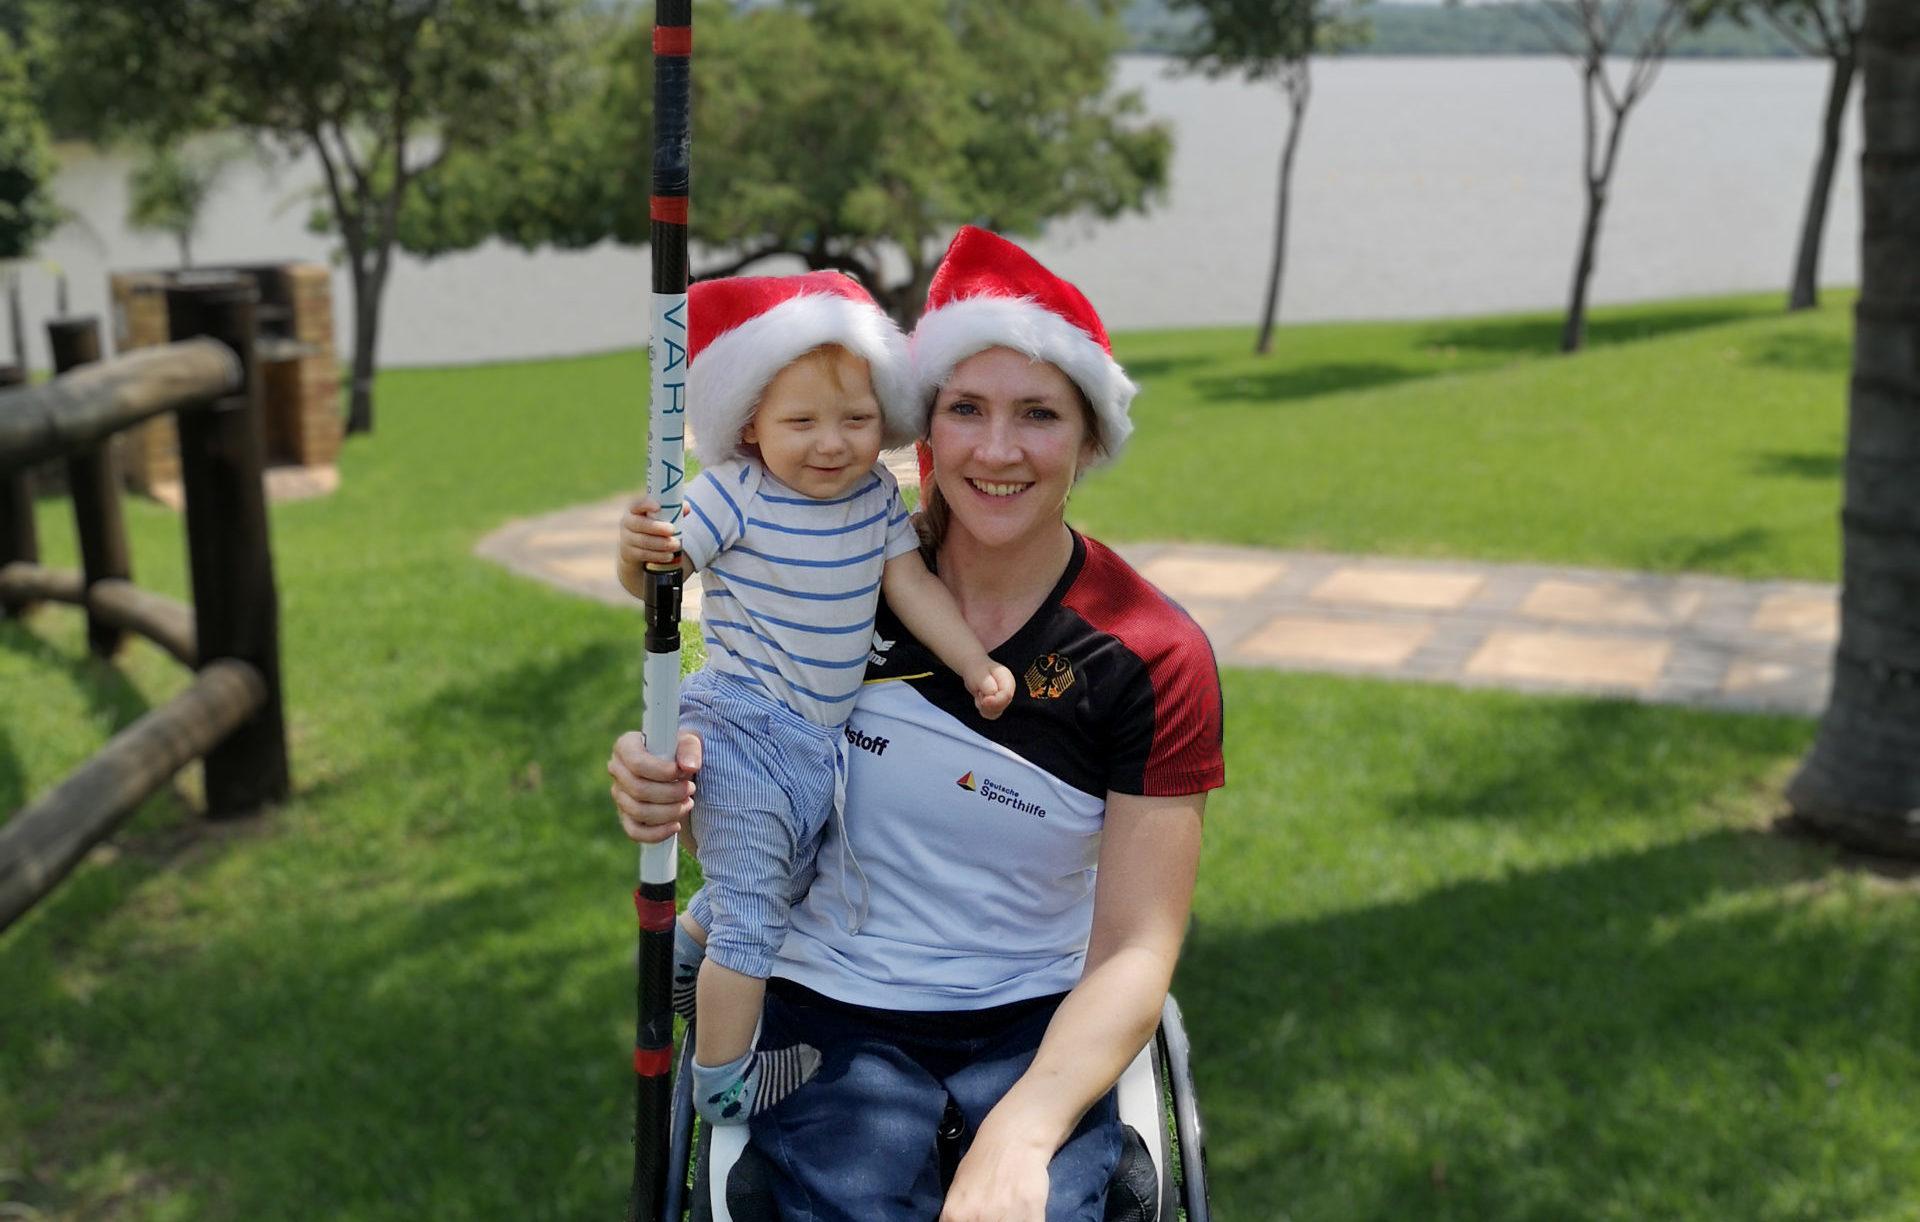 Olympionikin Edina Müller im Rollstuhl mit Kind